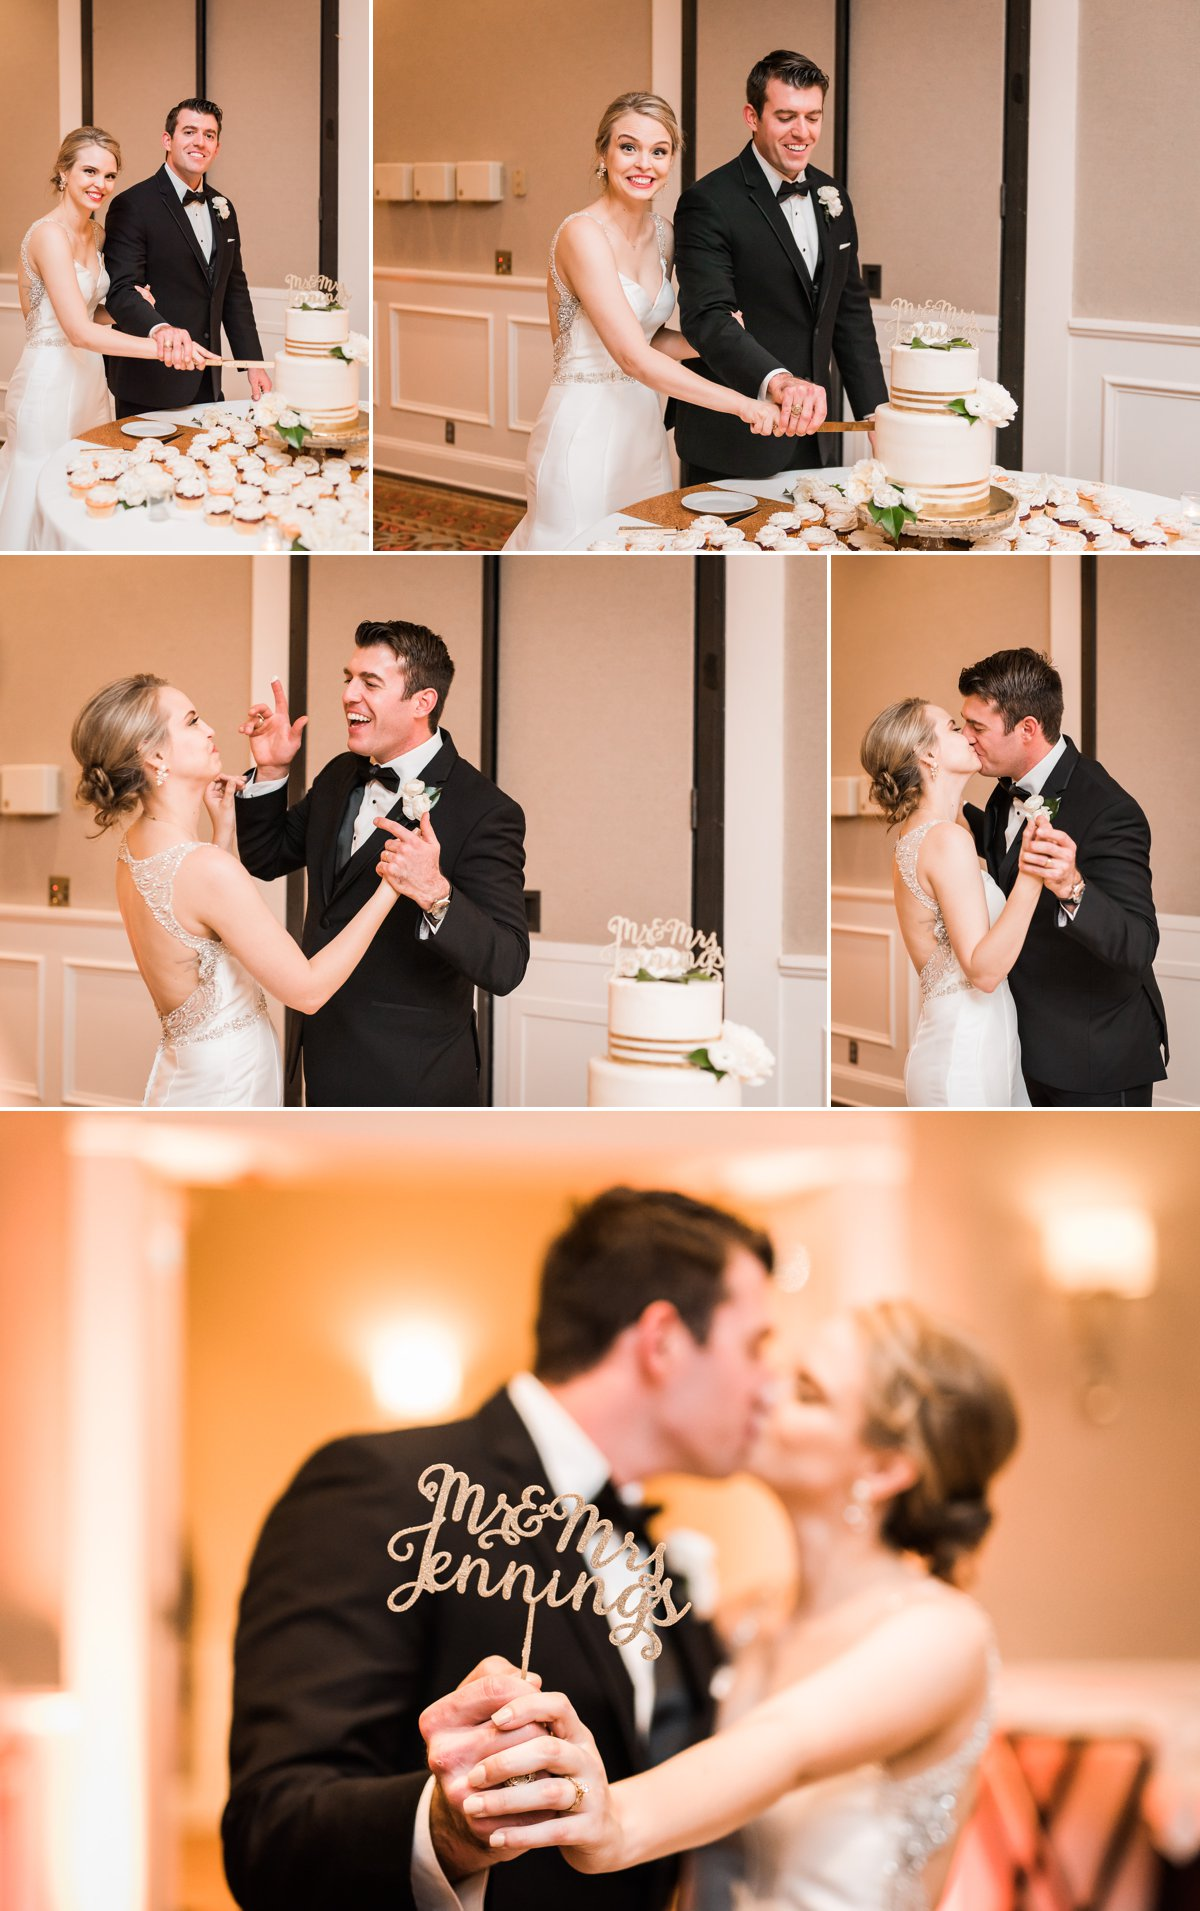 Lauren & Bryan Wedding Cake Cutting Photos